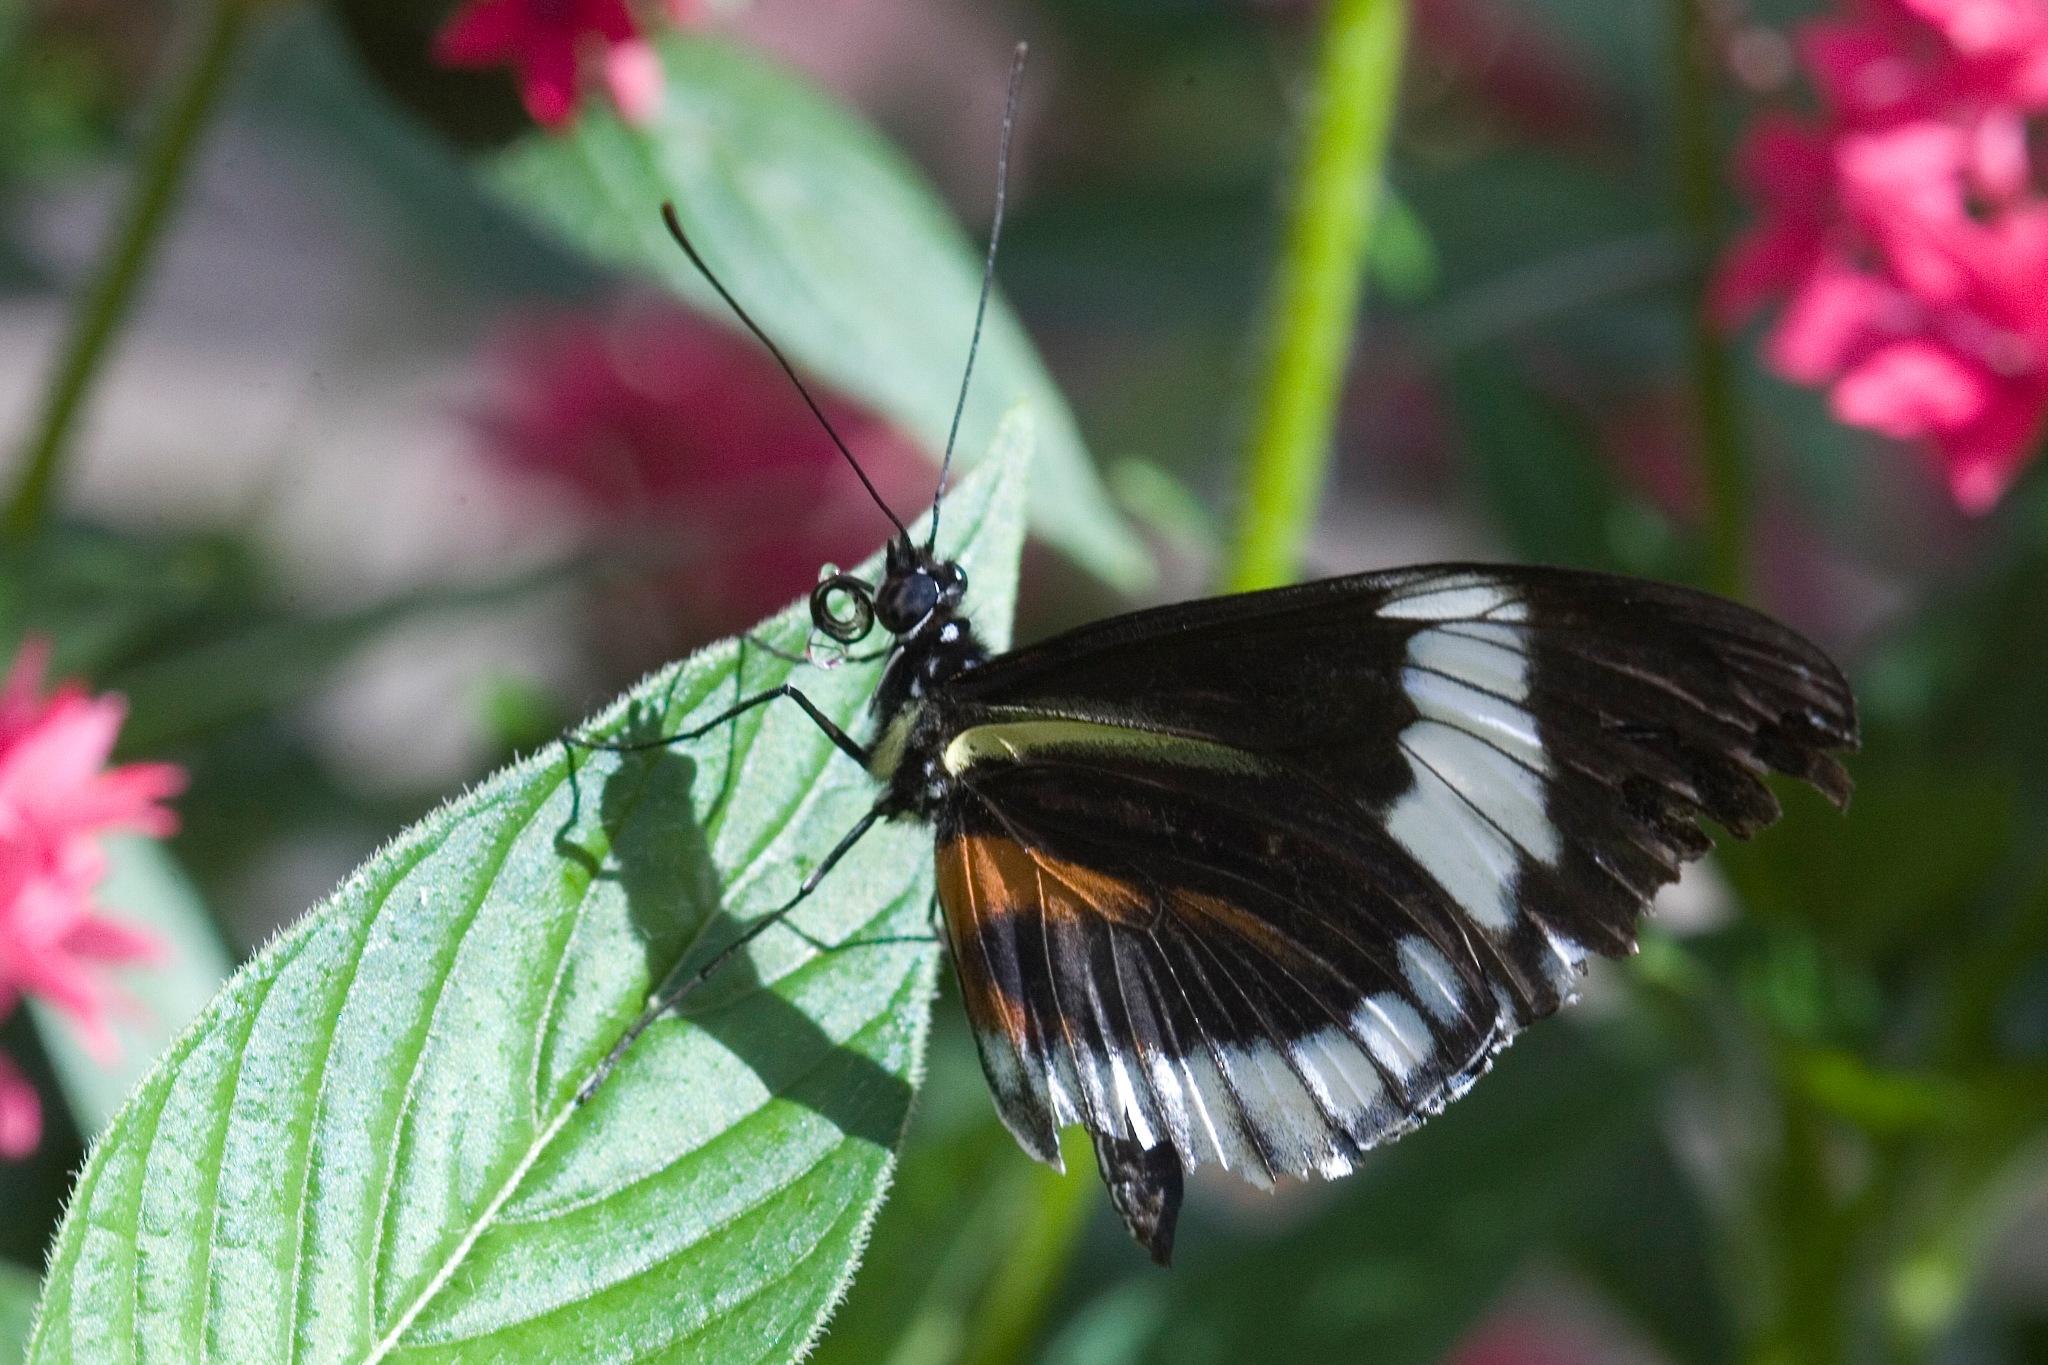 black, white, orange butterfly close up by Bernard Mordorski